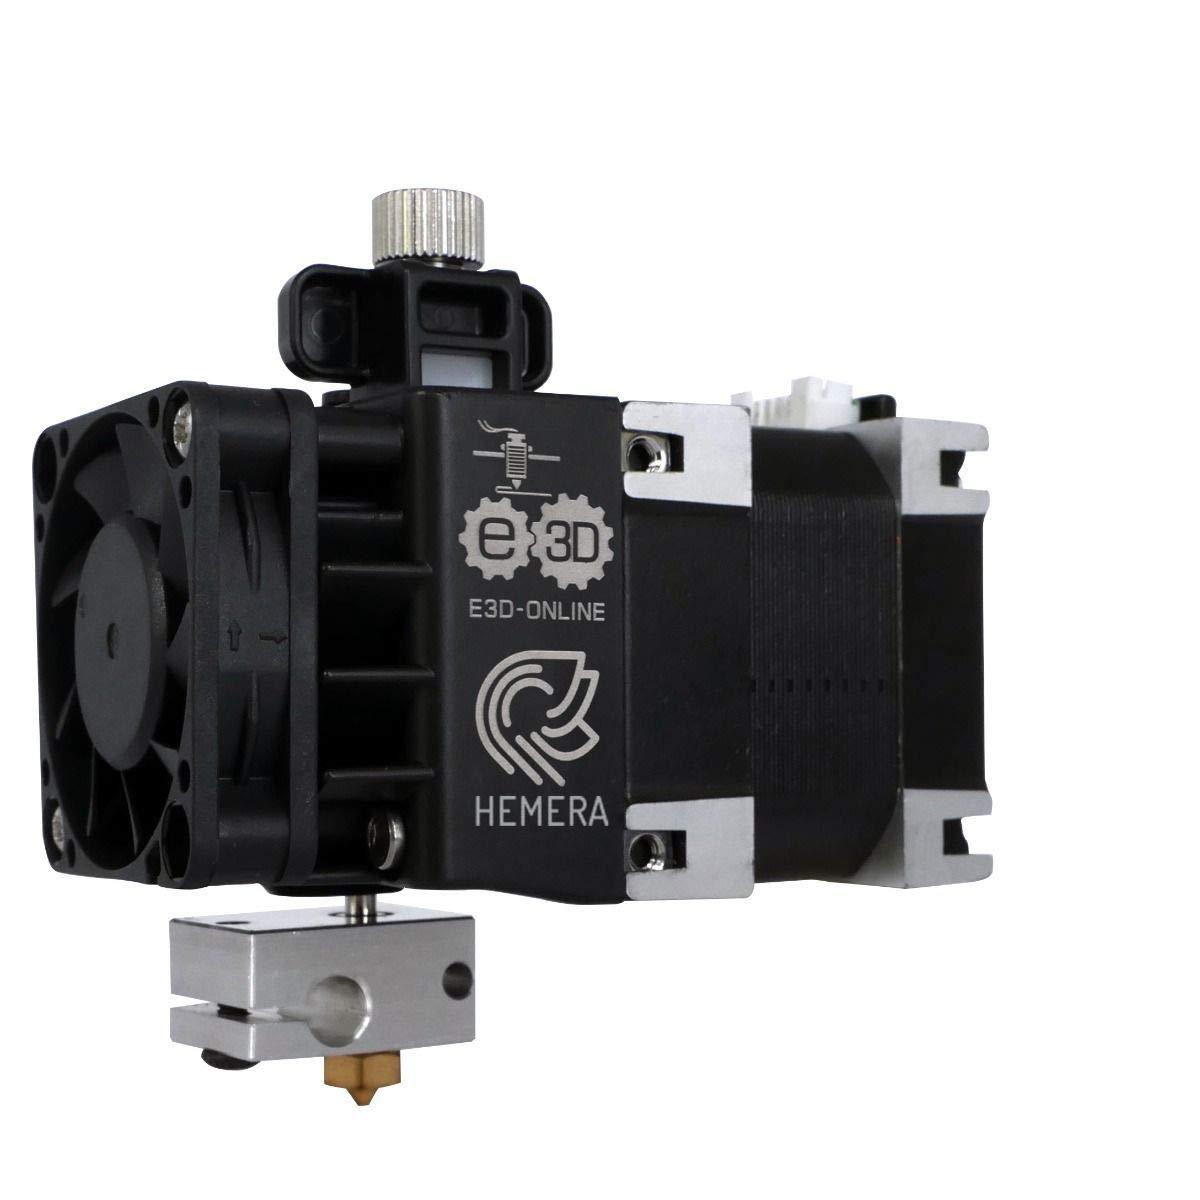 Genuine E3D Hemera Ventilador 24V: Amazon.es: Industria